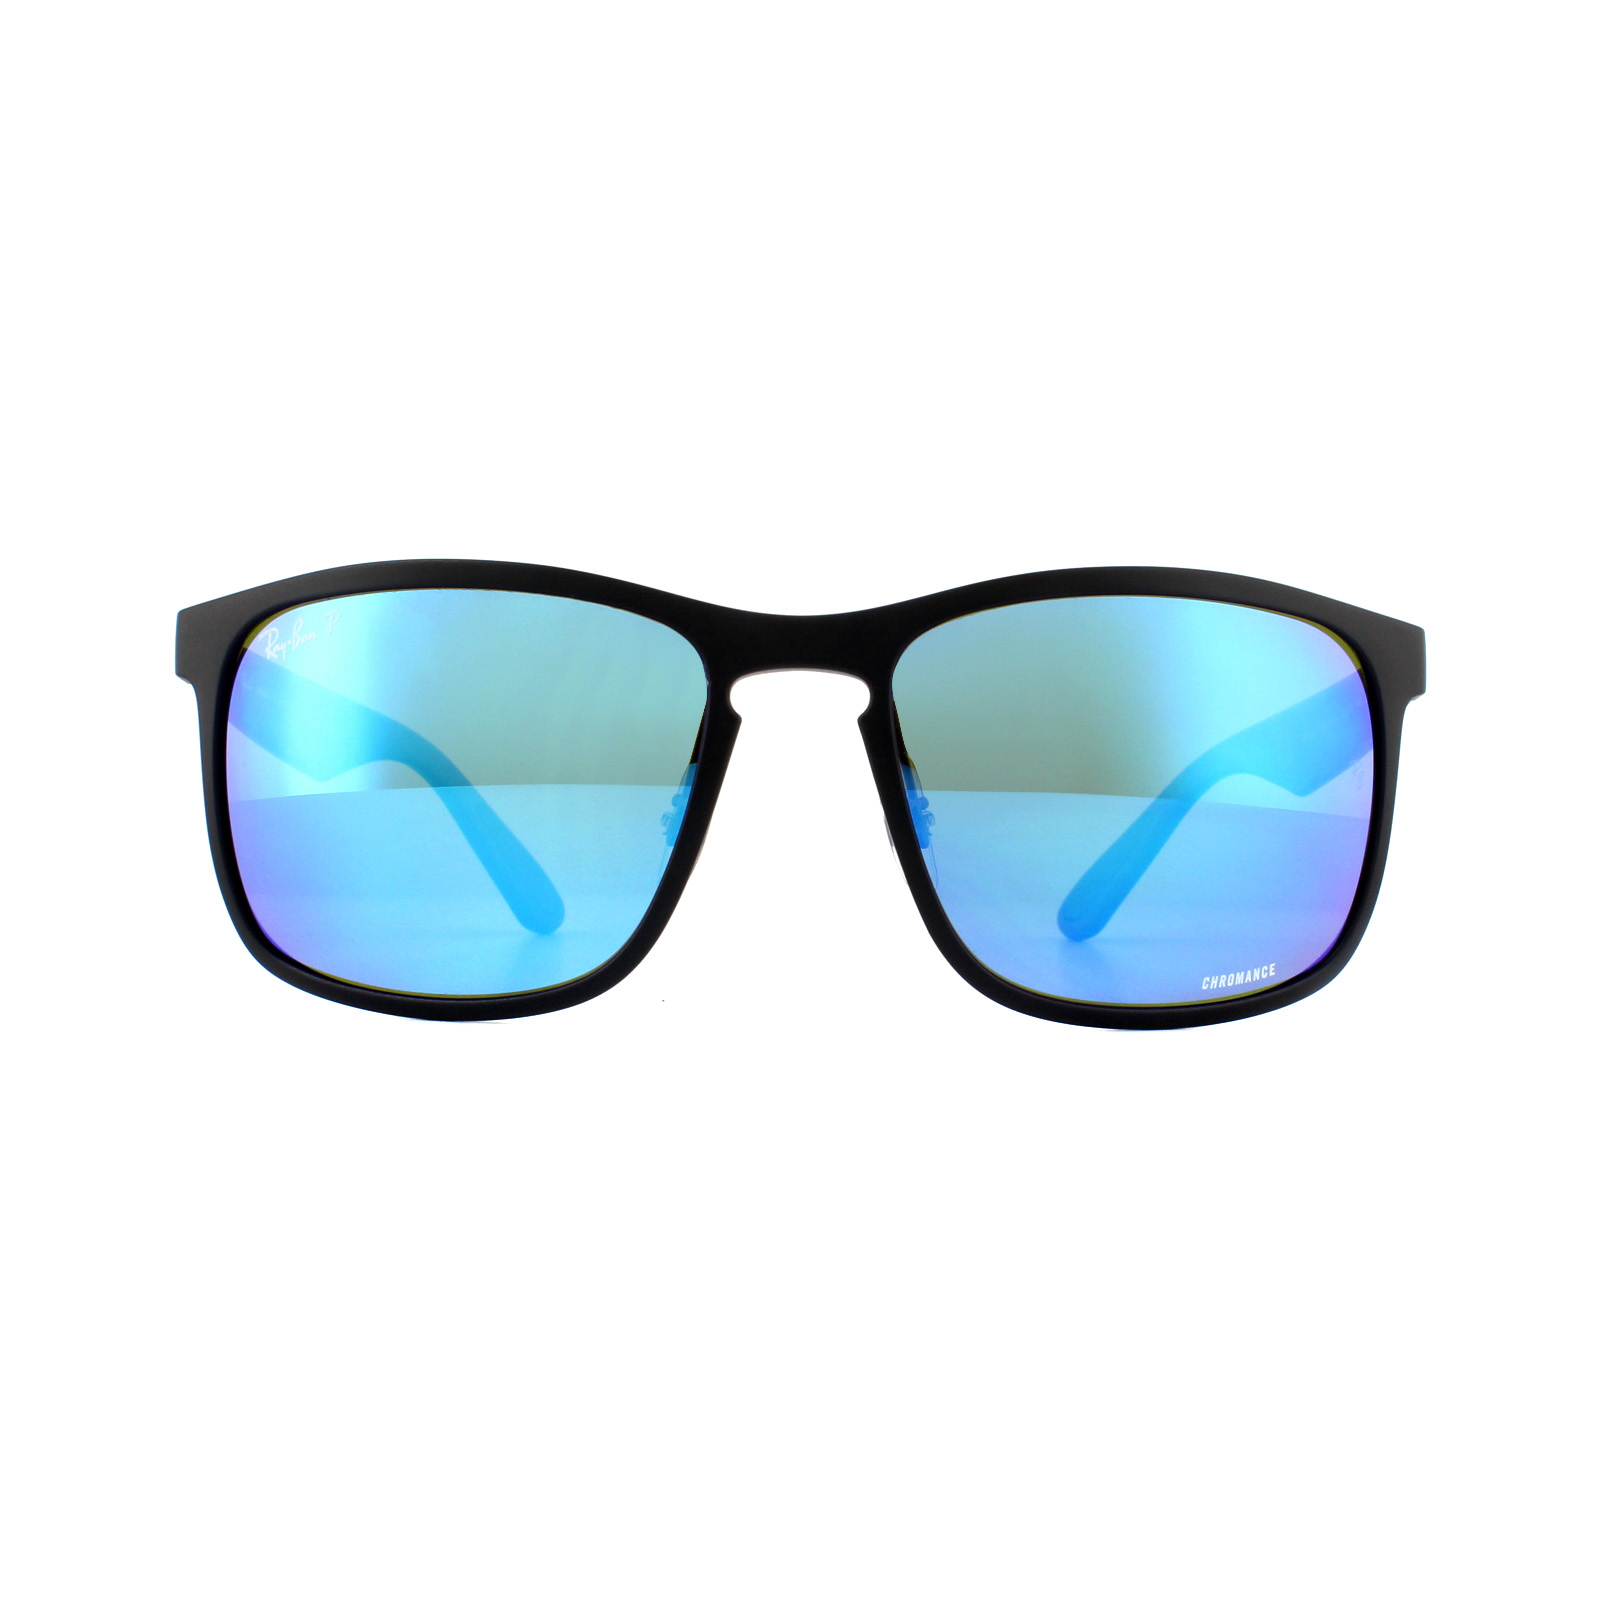 8ba8648744 Sentinel Ray-Ban Sunglasses RB4264 601SA1 Matte Black Blue Flash Polarized  Chromance